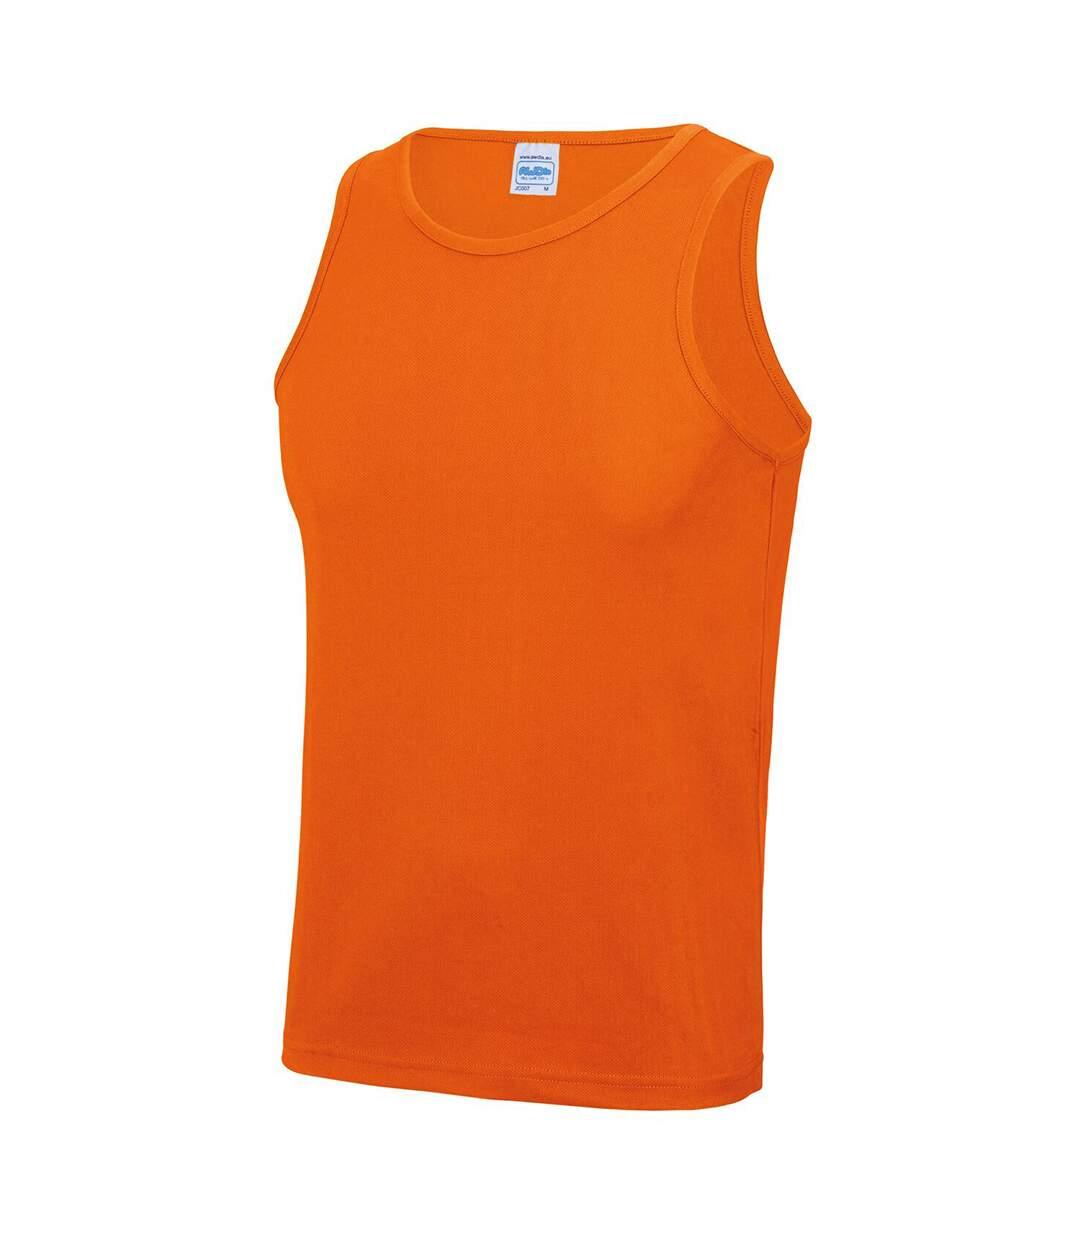 Just Cool Mens Sports Gym Plain Tank / Vest Top (Hot Pink) - UTRW687